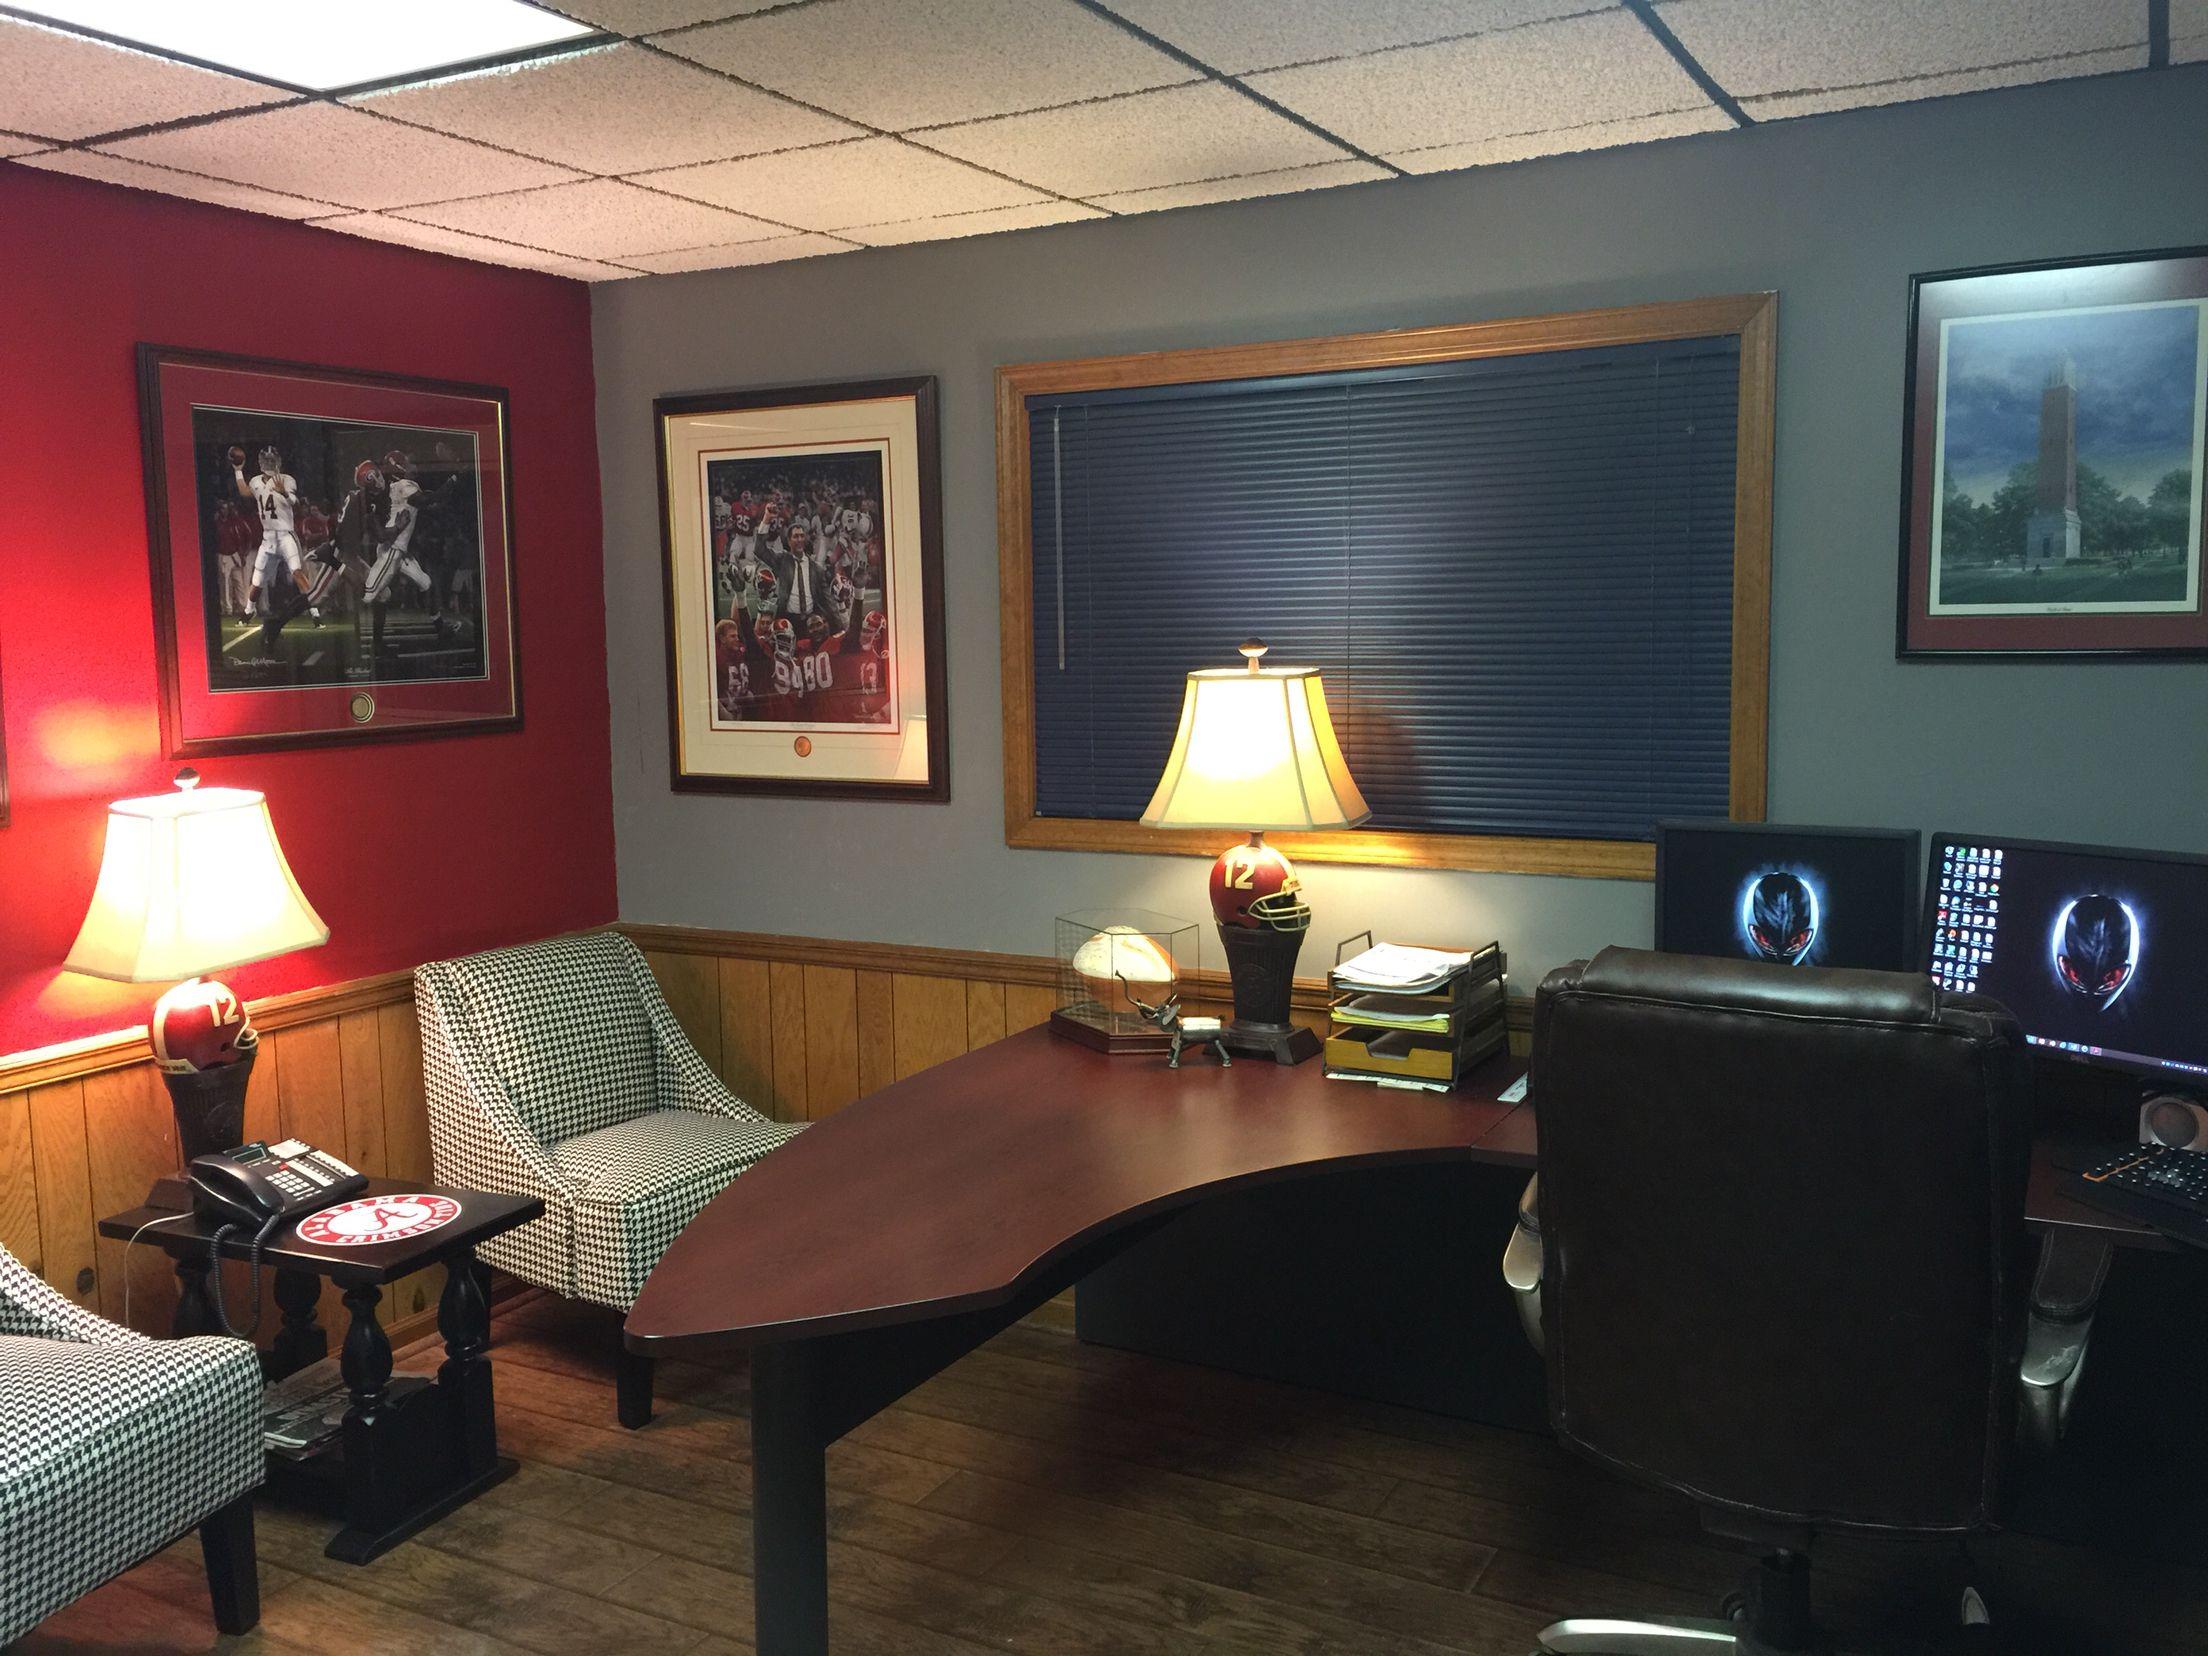 Alabama football office